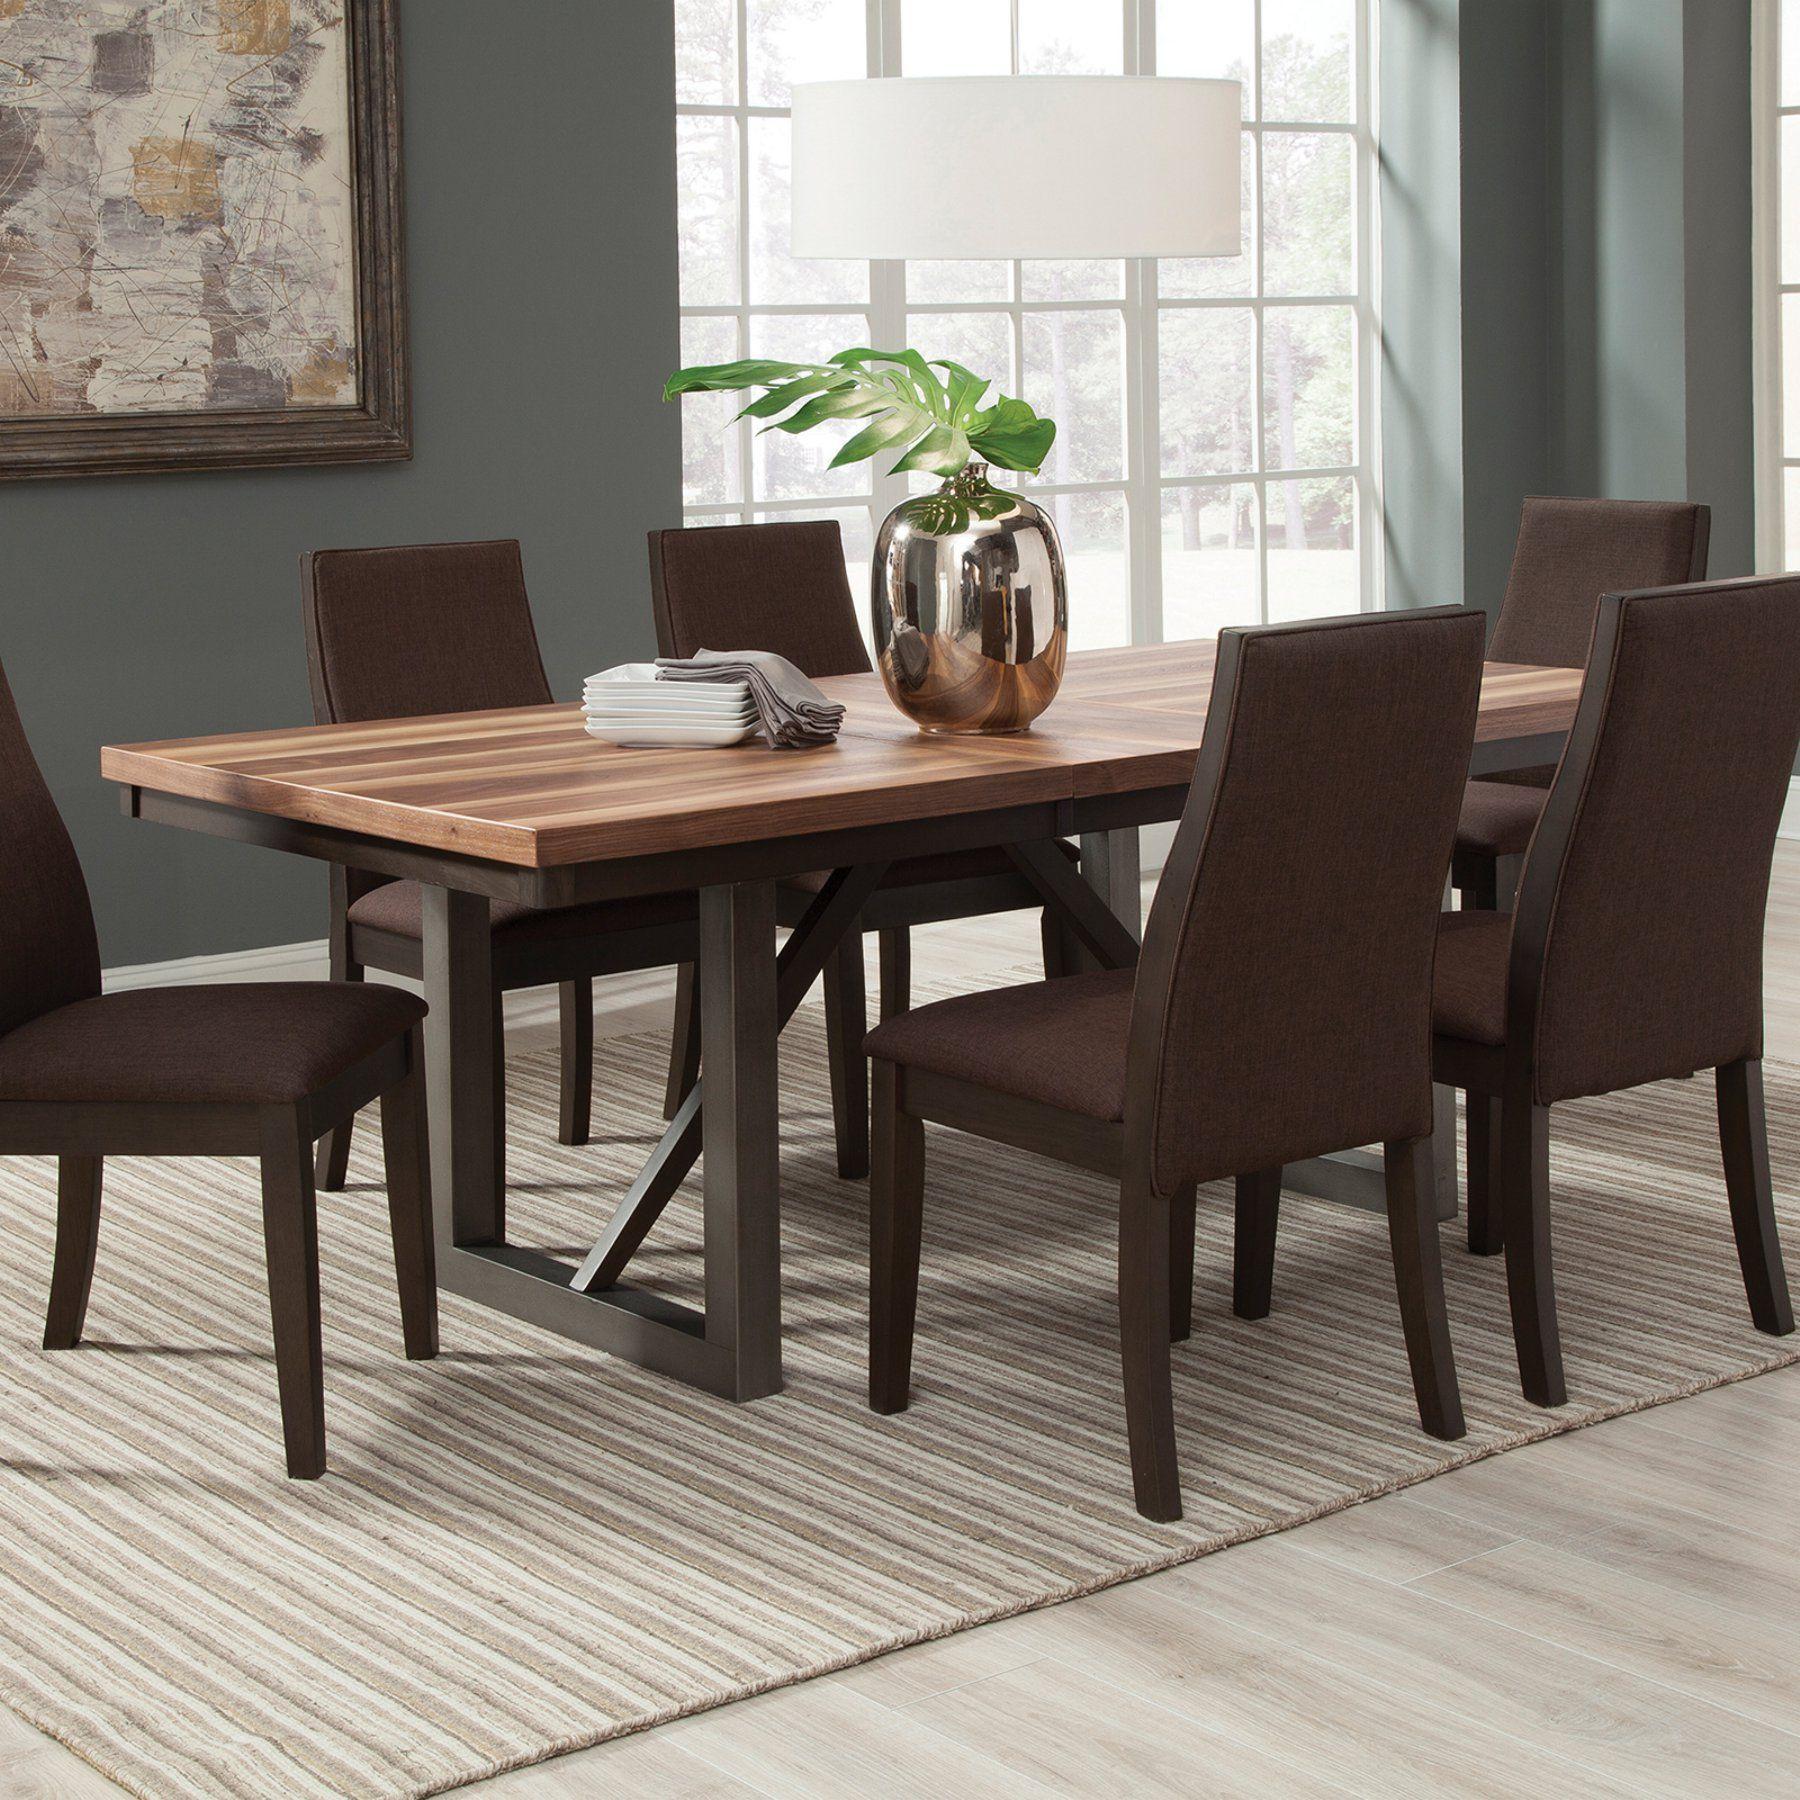 Coaster Furniture Spring Creek Dining Table - 106581